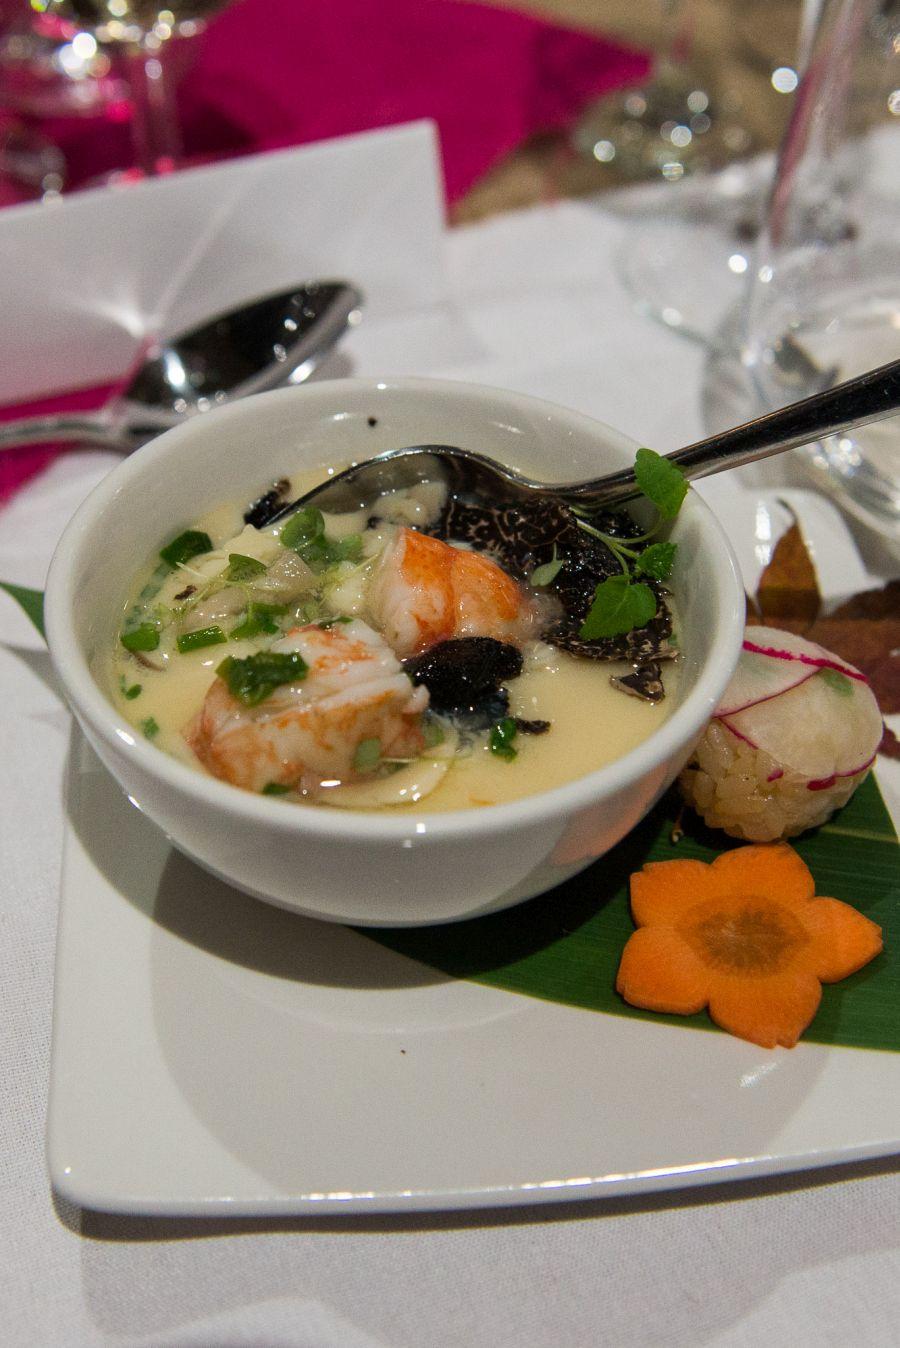 Marron, mushrooms and truffle in the chawan-mushi